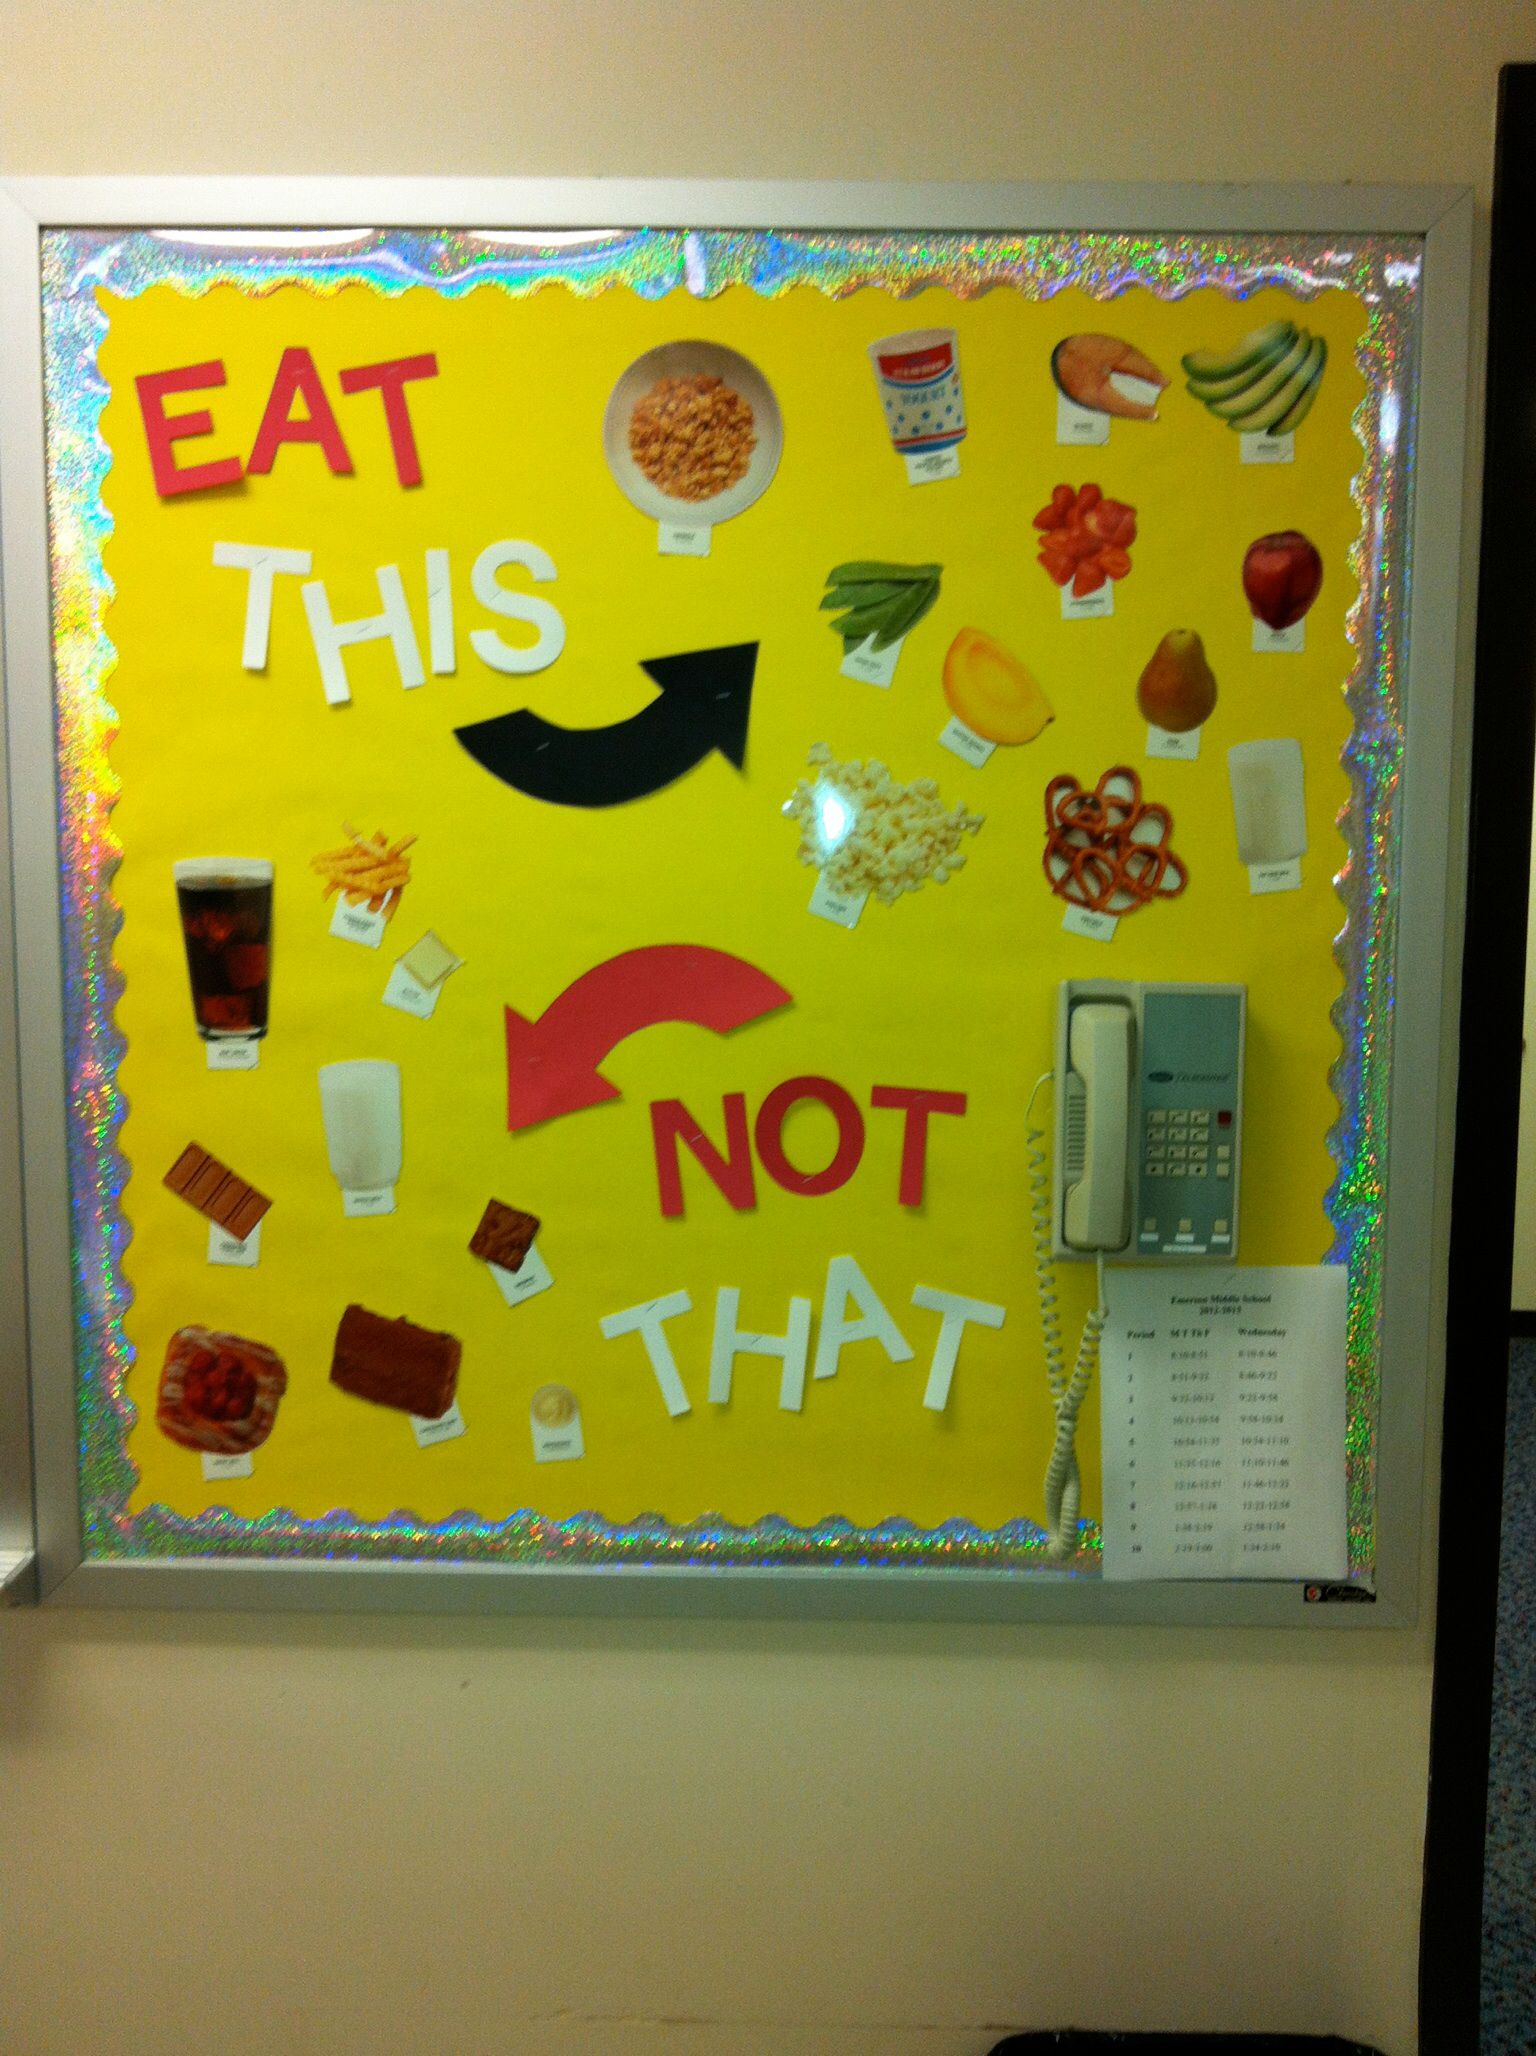 Classroom Bulletin Board Ideas Nutrition Month : Facs classroom bulletin board on quot eat this not that